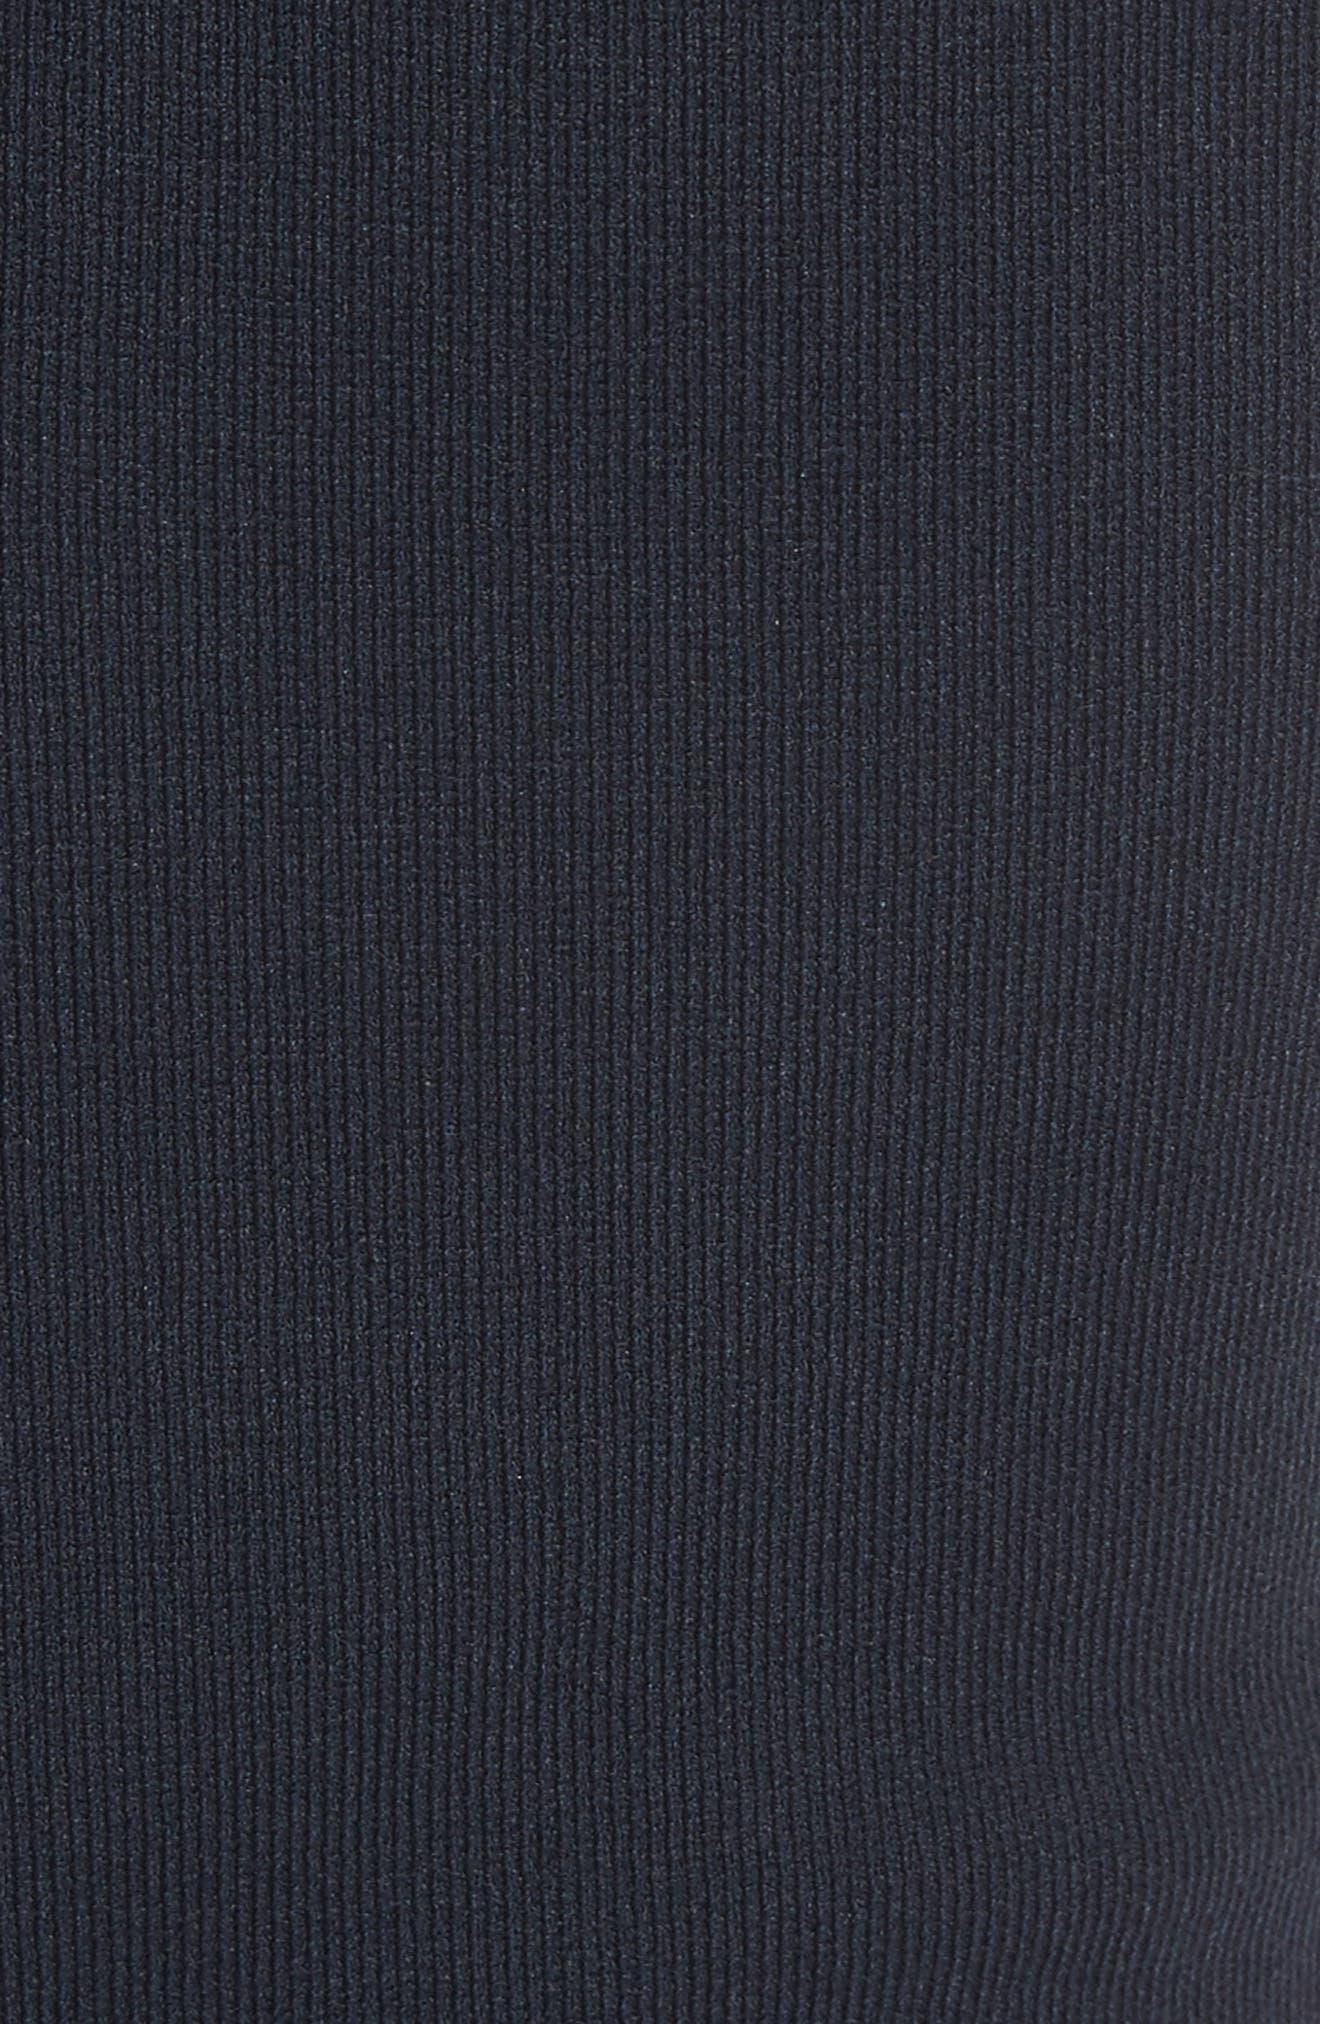 Woven Trim Fit & Flare Dress,                             Alternate thumbnail 5, color,